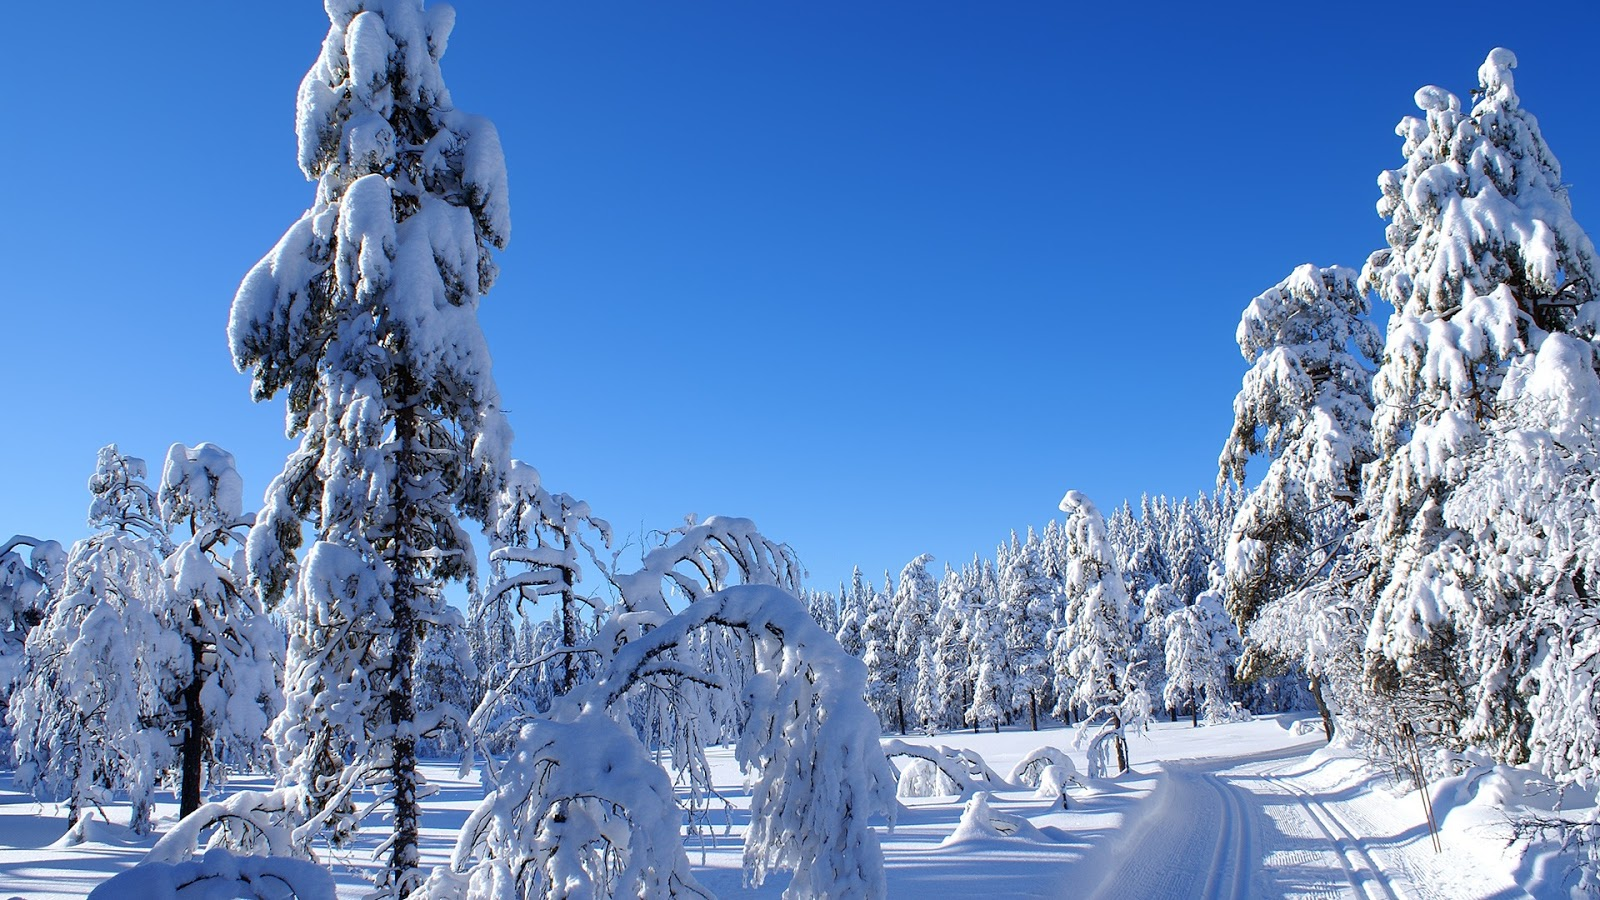 beautiful winter scenery winter wallpaper winter snowfall beautiful 1600x900